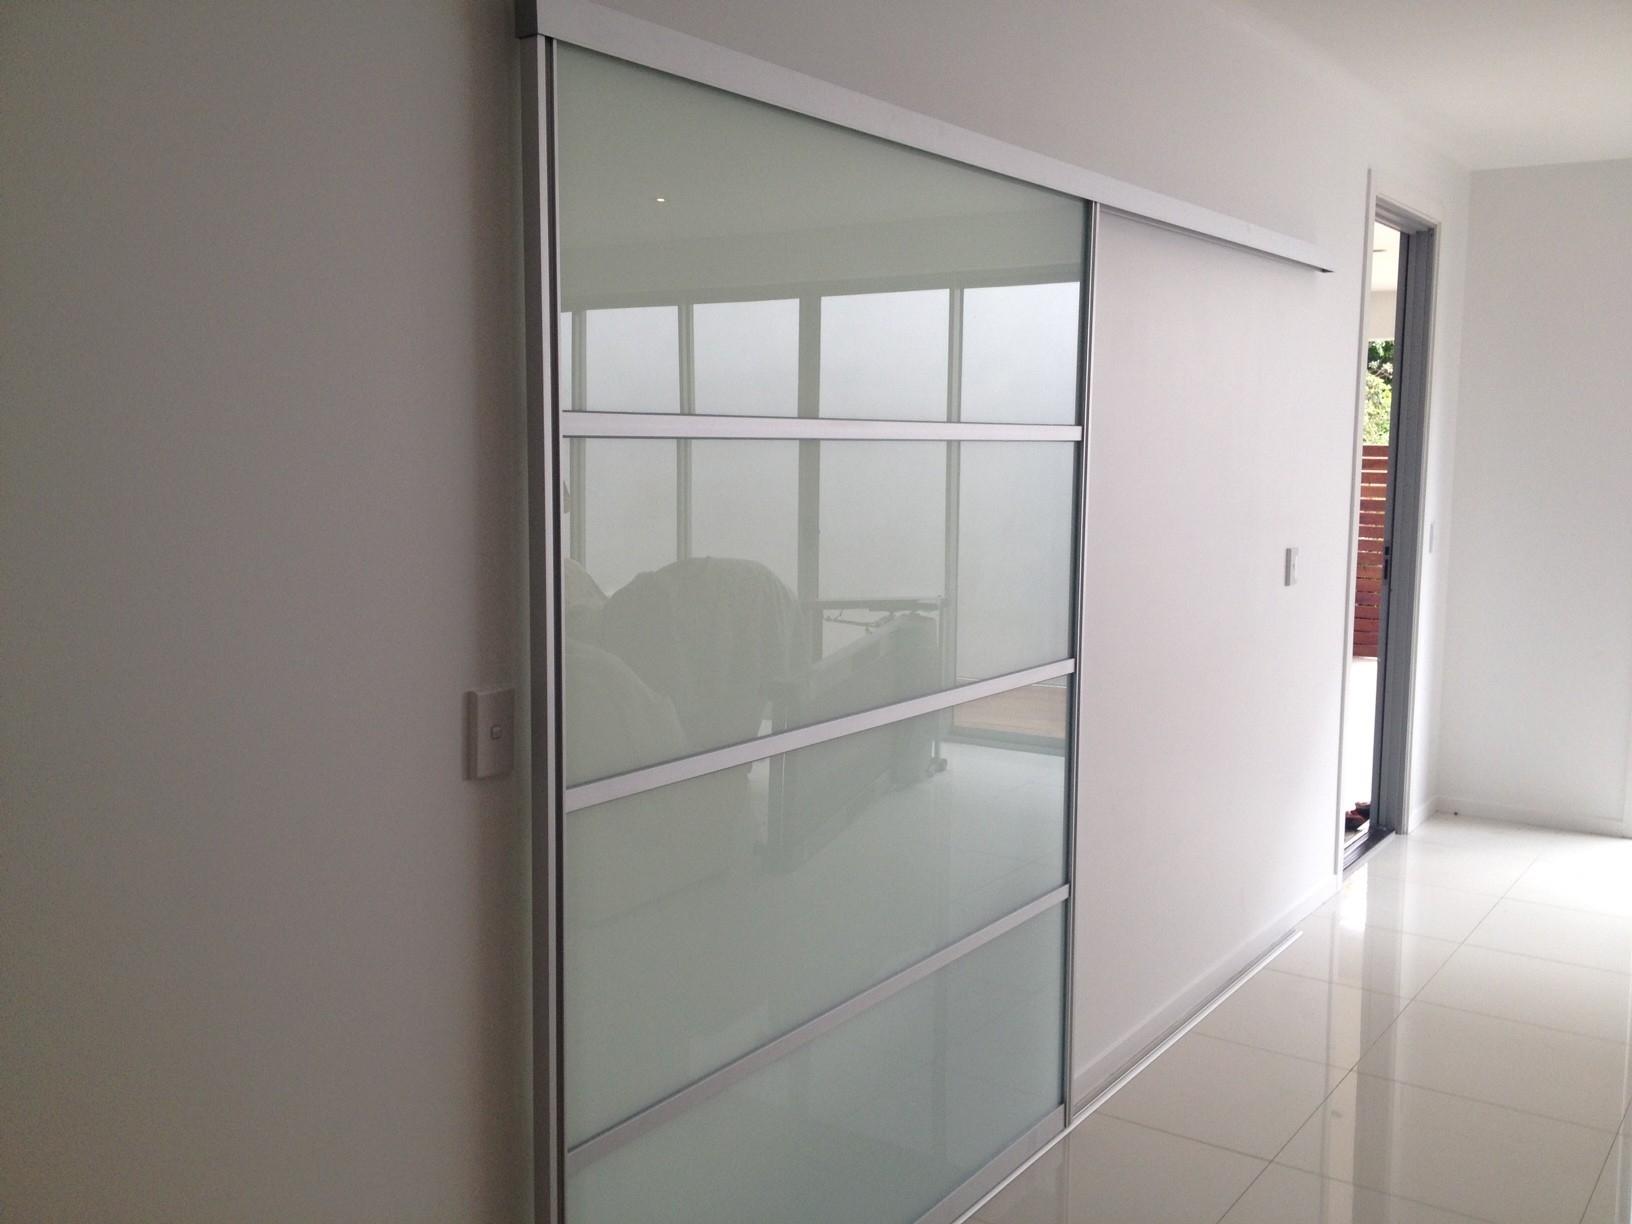 Ceiling Mounted Sliding Glass Door